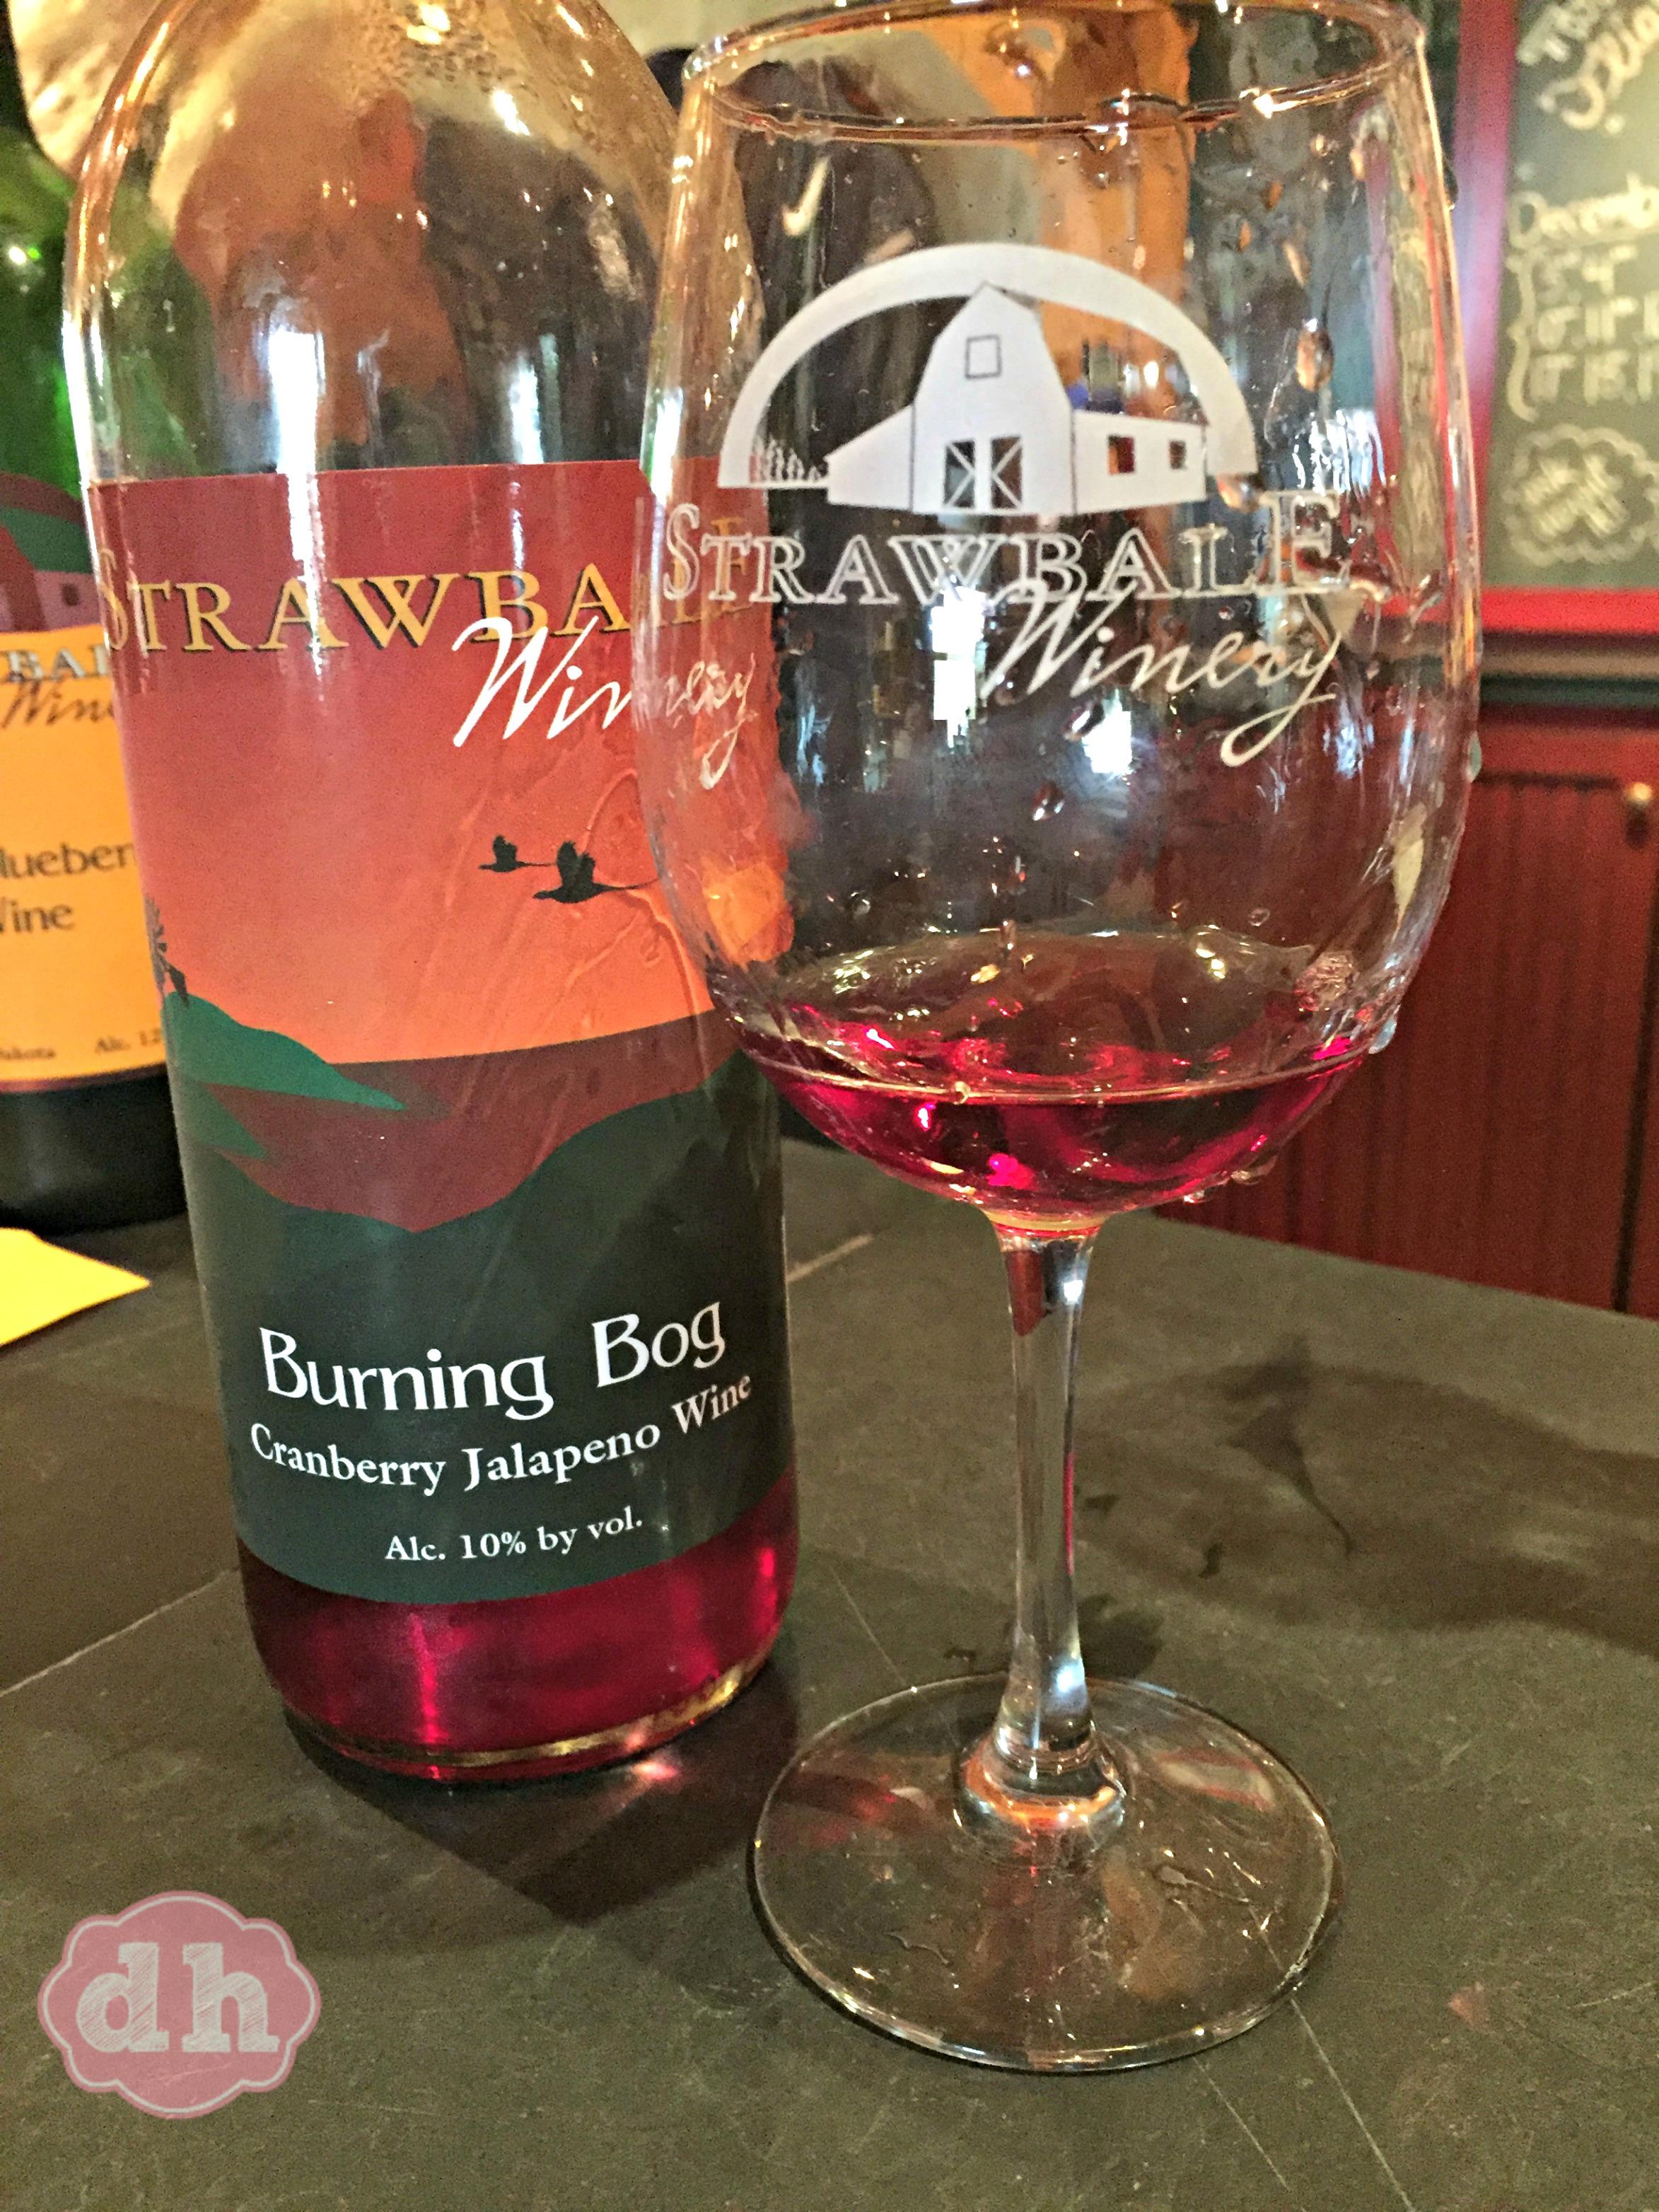 Burning Bog at Strawbale Winery